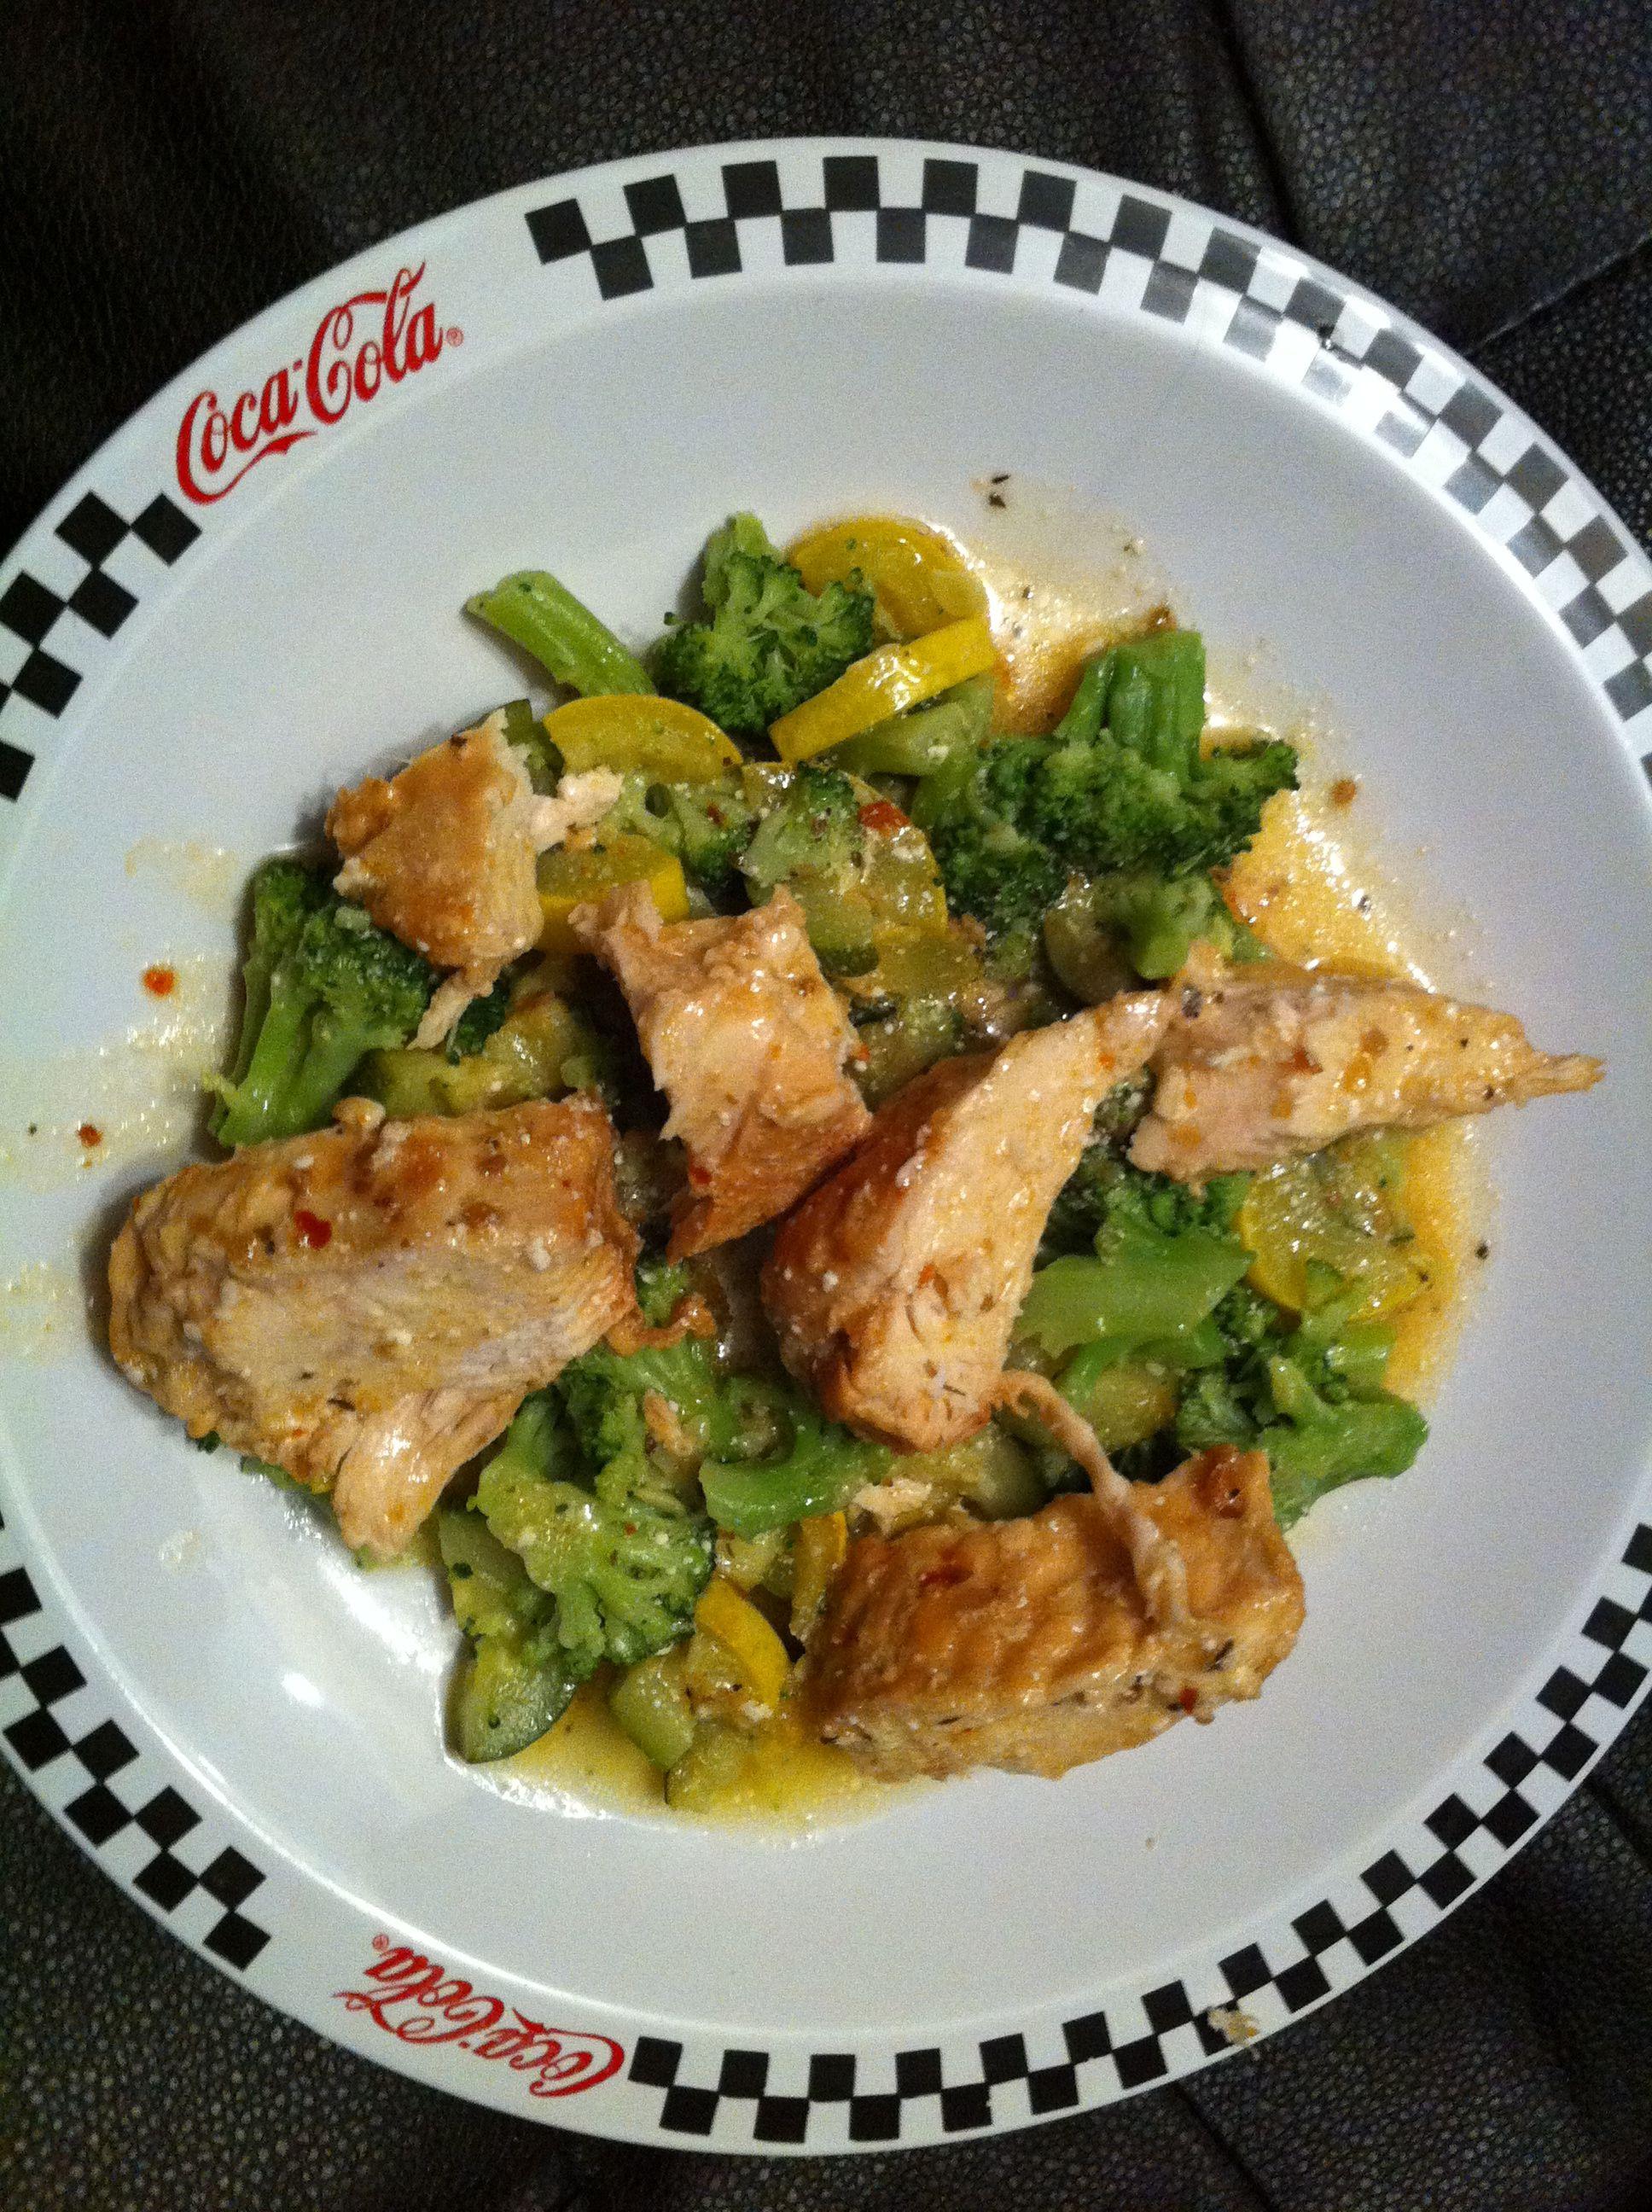 Healthy Low Carb Crock Pot Recipes  Low carb creamy italian chicken in crock pot